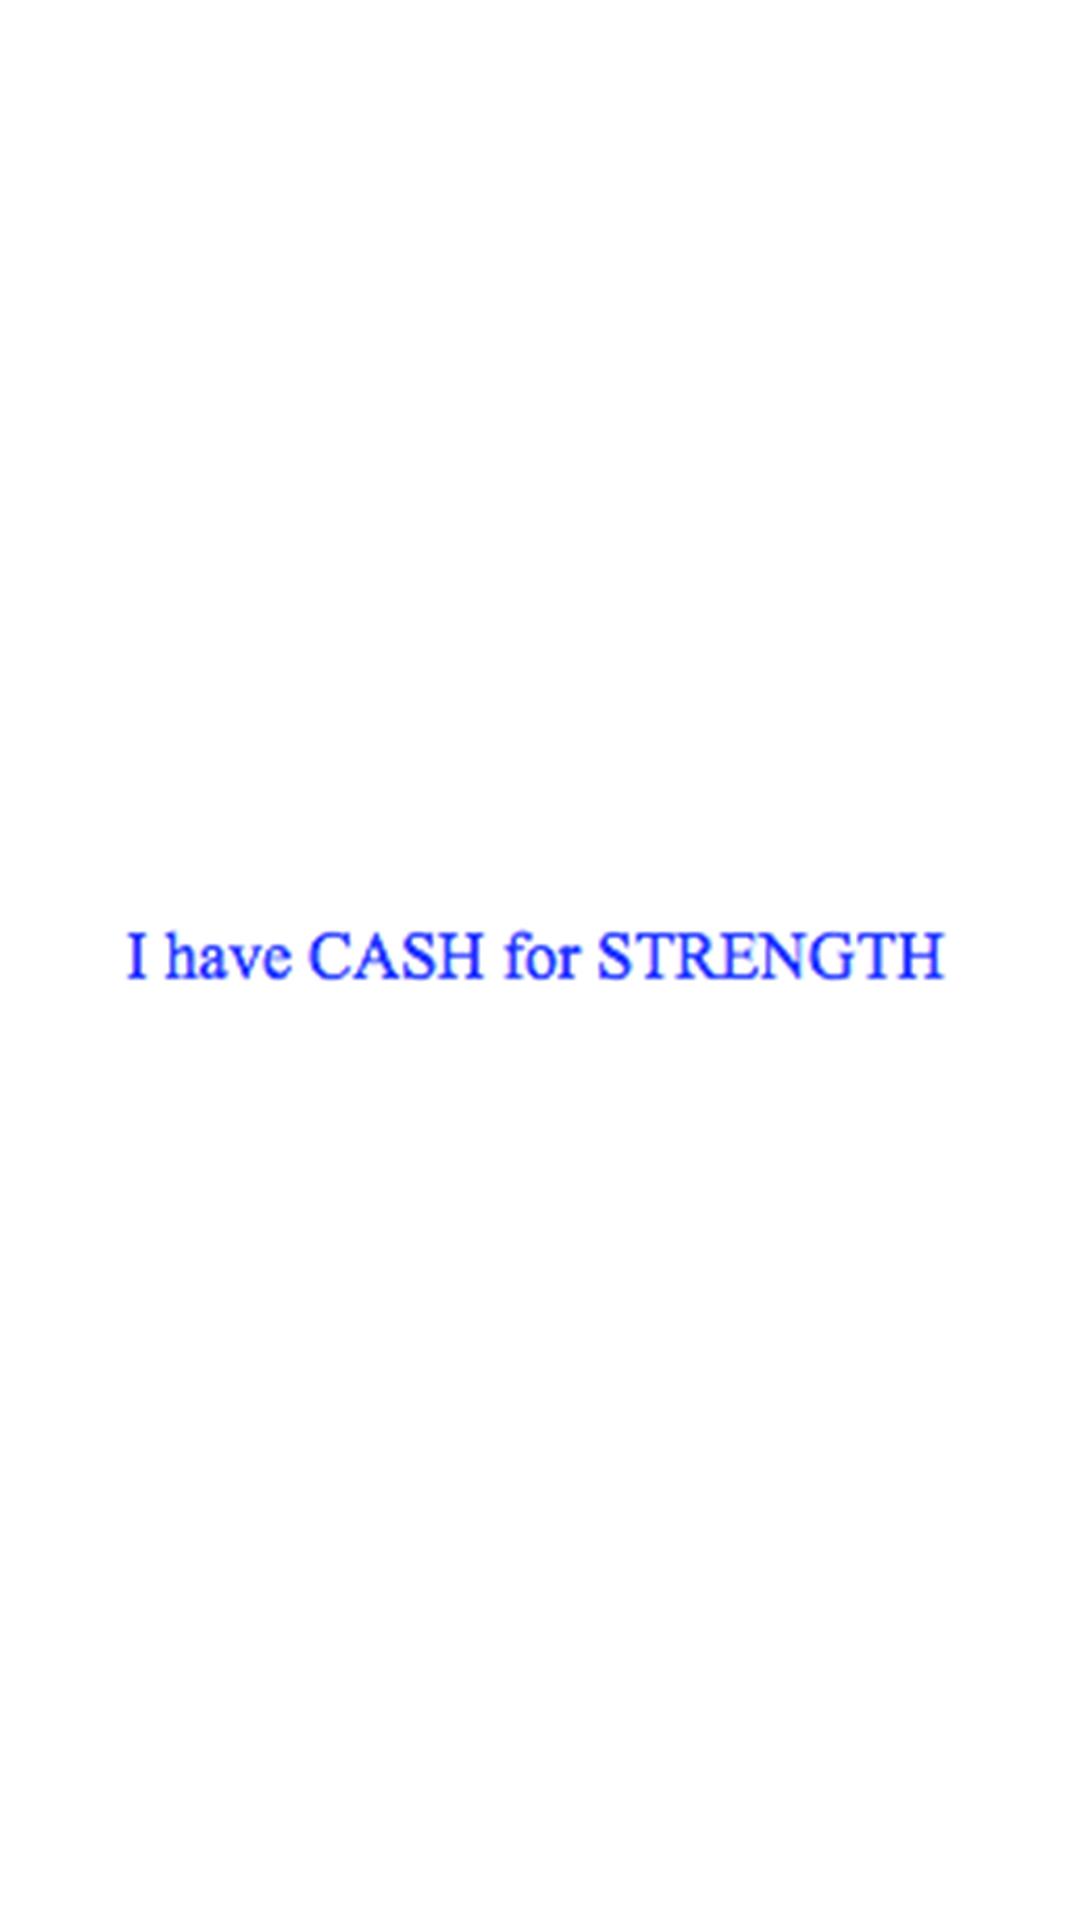 cash4strength.jpg